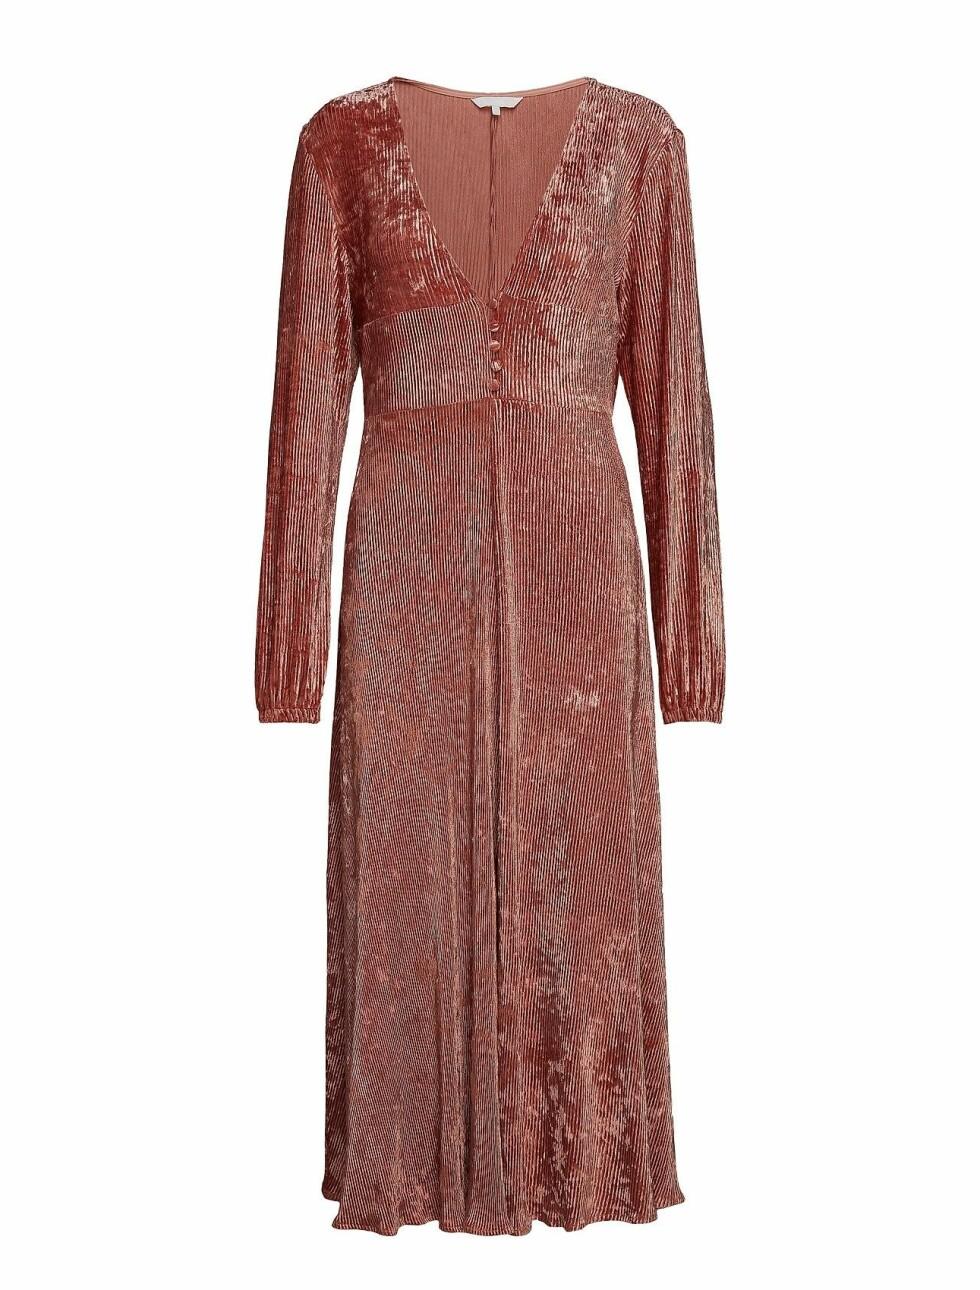 Kjole fra Aeryne |1695,-| https://www.boozt.com/no/no/aeryne/lilou-dress_19718718/19718719?path=67362&navId=67362&sNavId=67453&group=listing&position=1000000